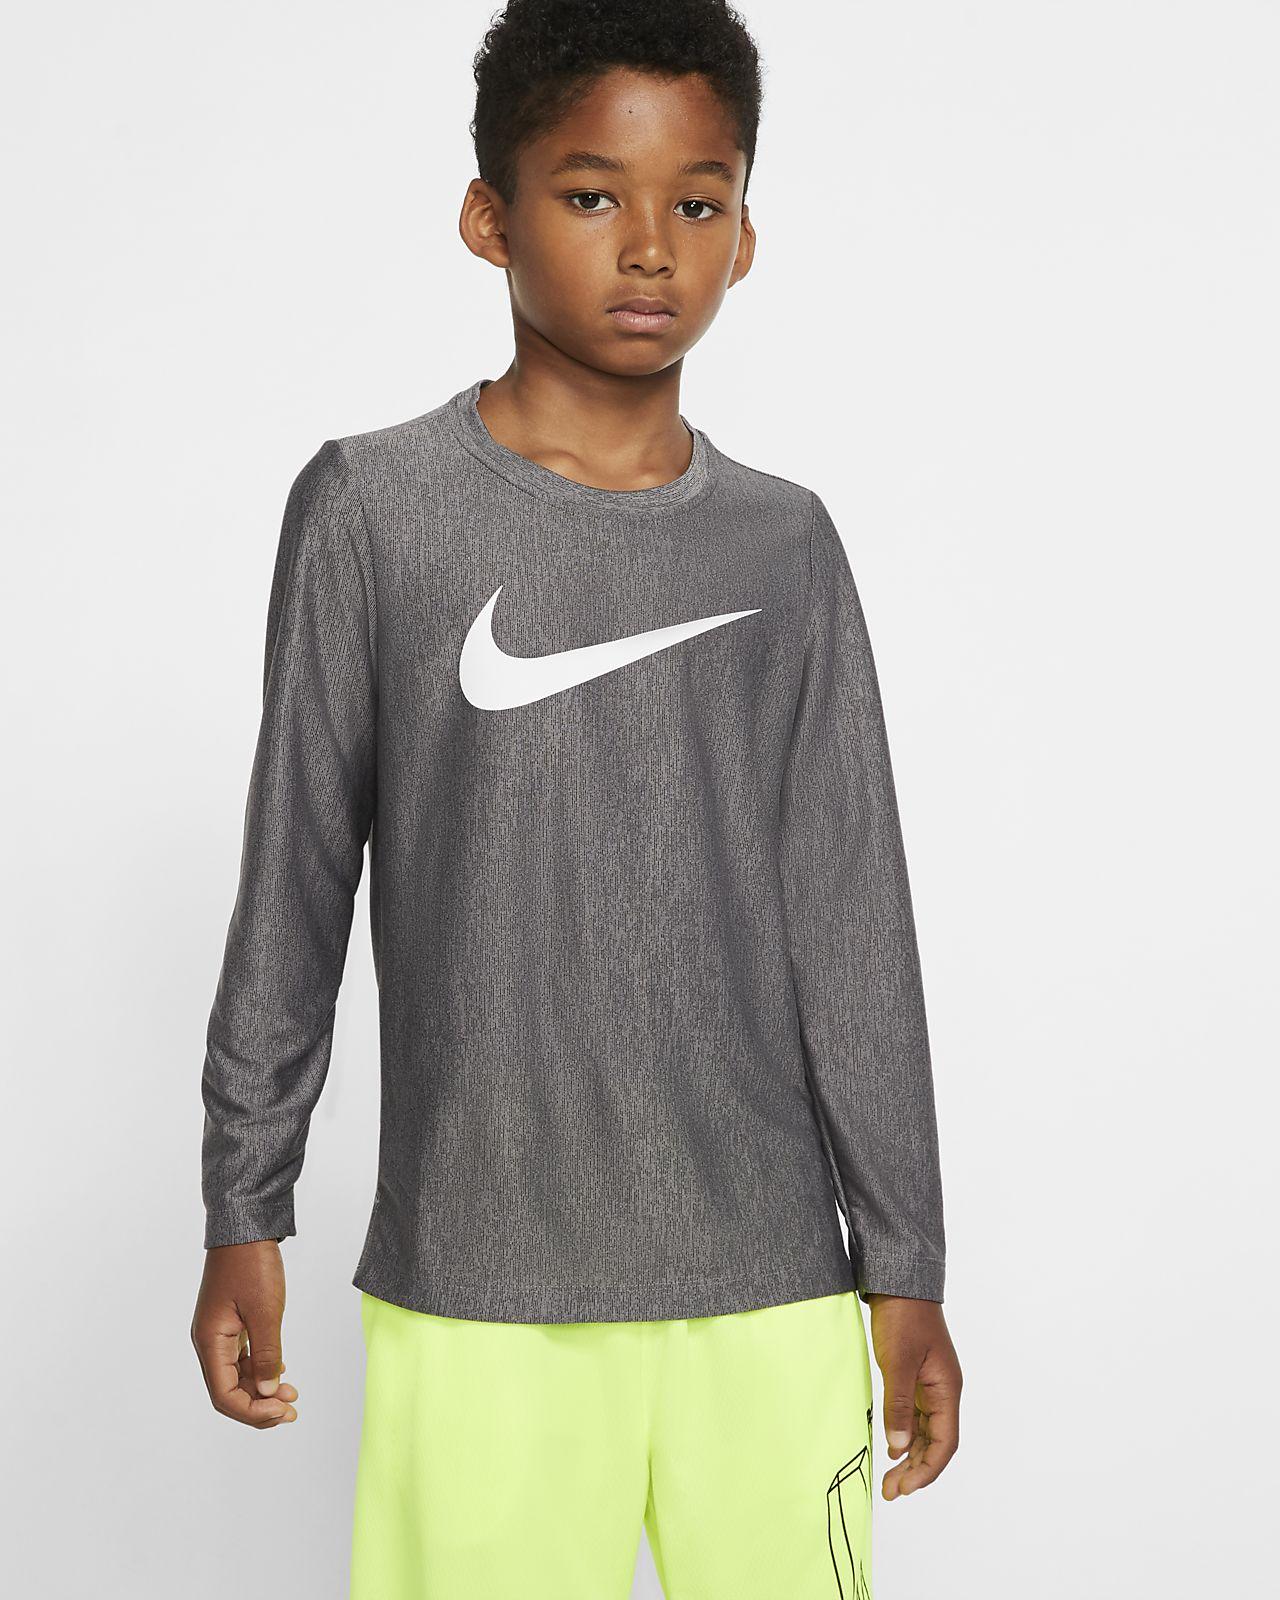 Maglia da training a manica lunga Nike Dri FIT Uomo